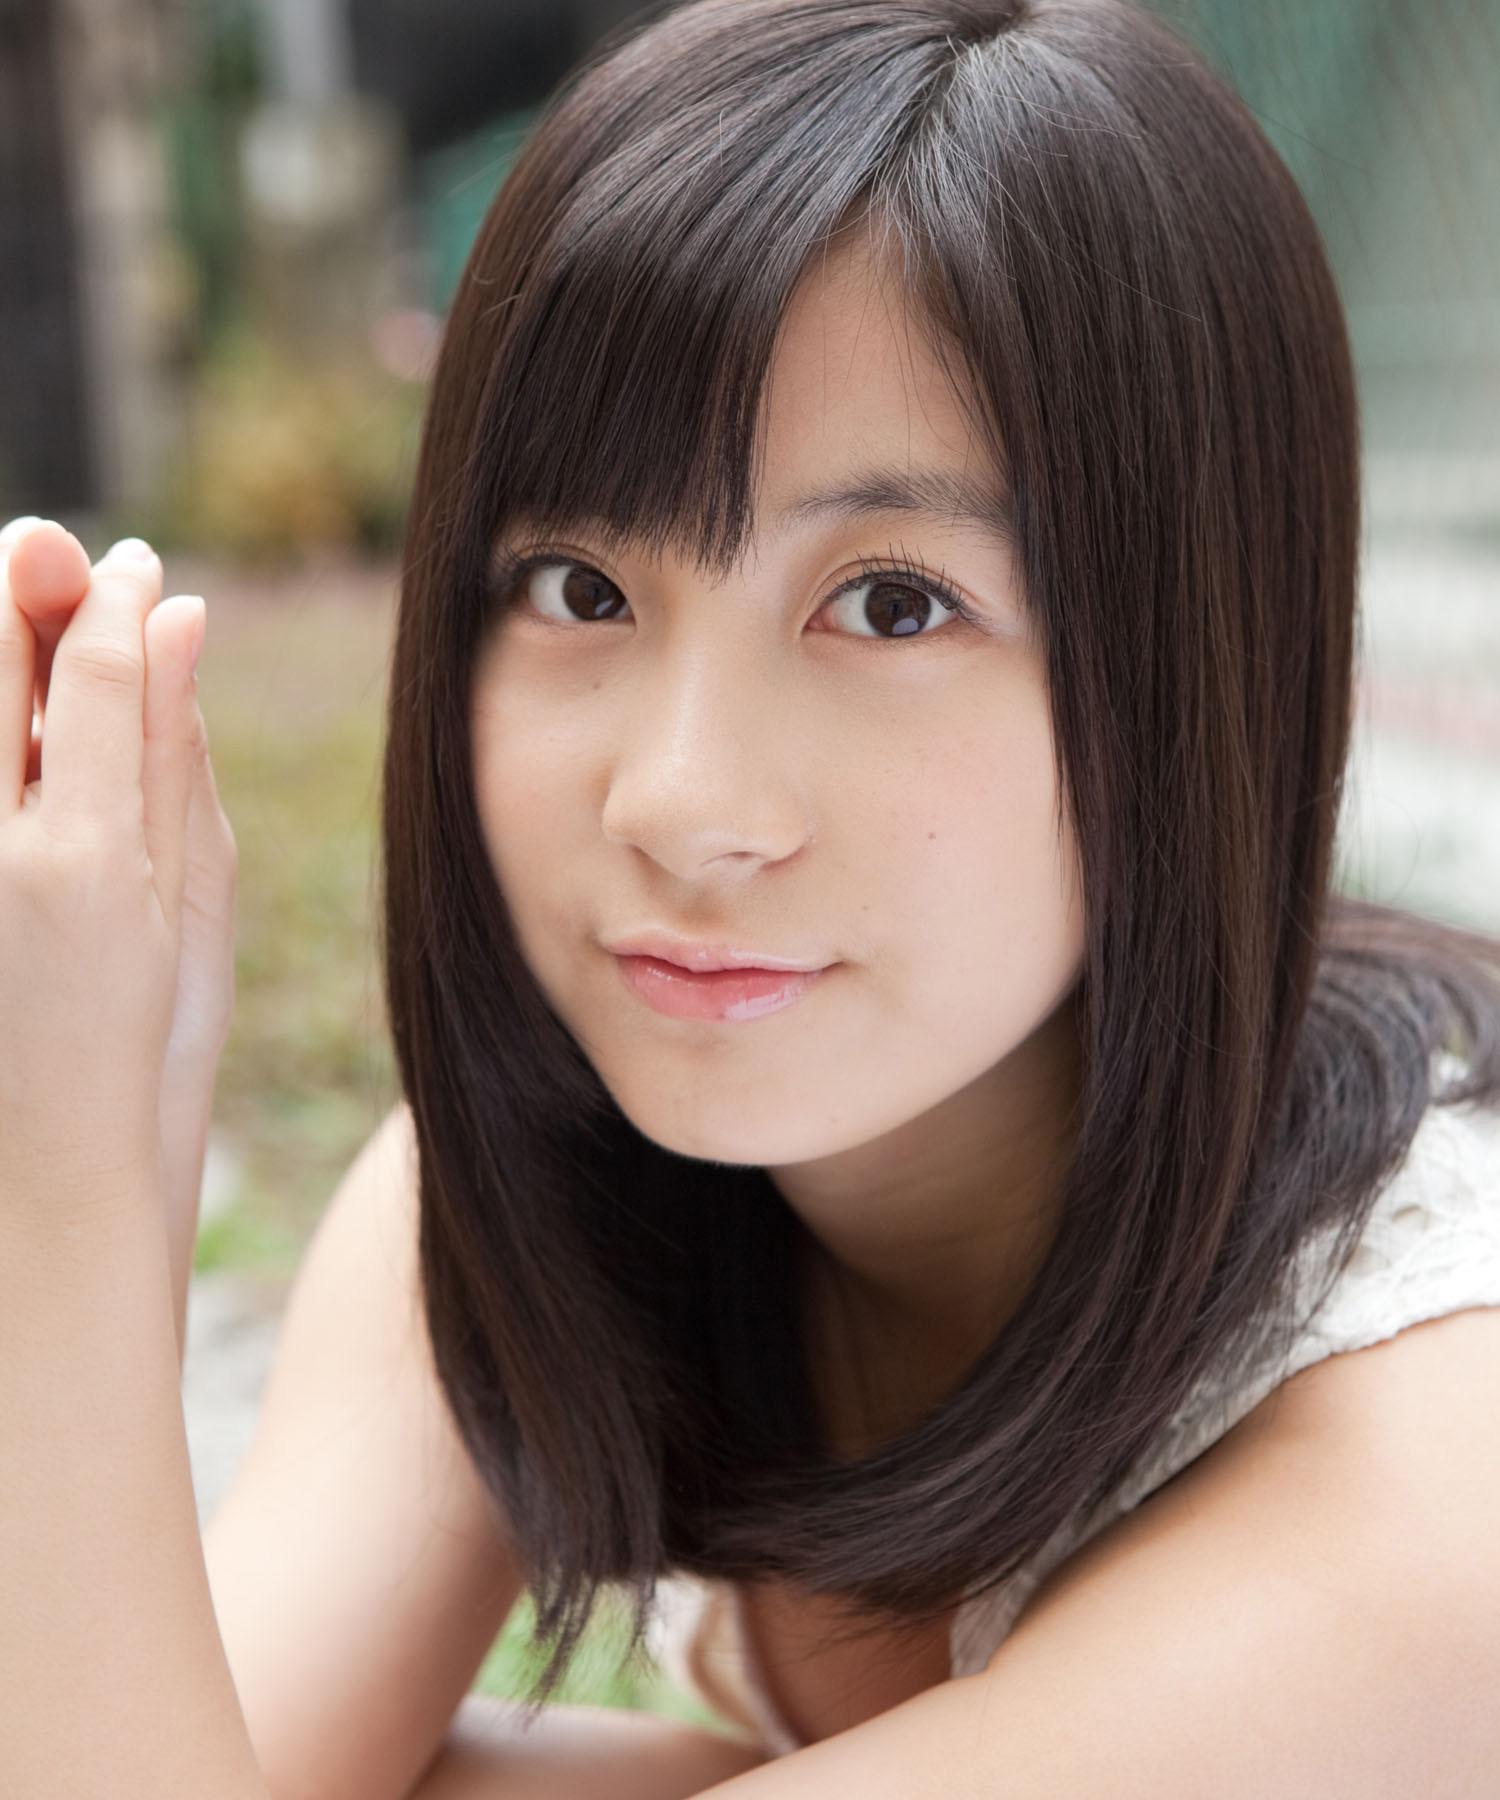 AKBや歌手として大人気だった小野恵令奈さんを画像で振り返りますのサムネイル画像